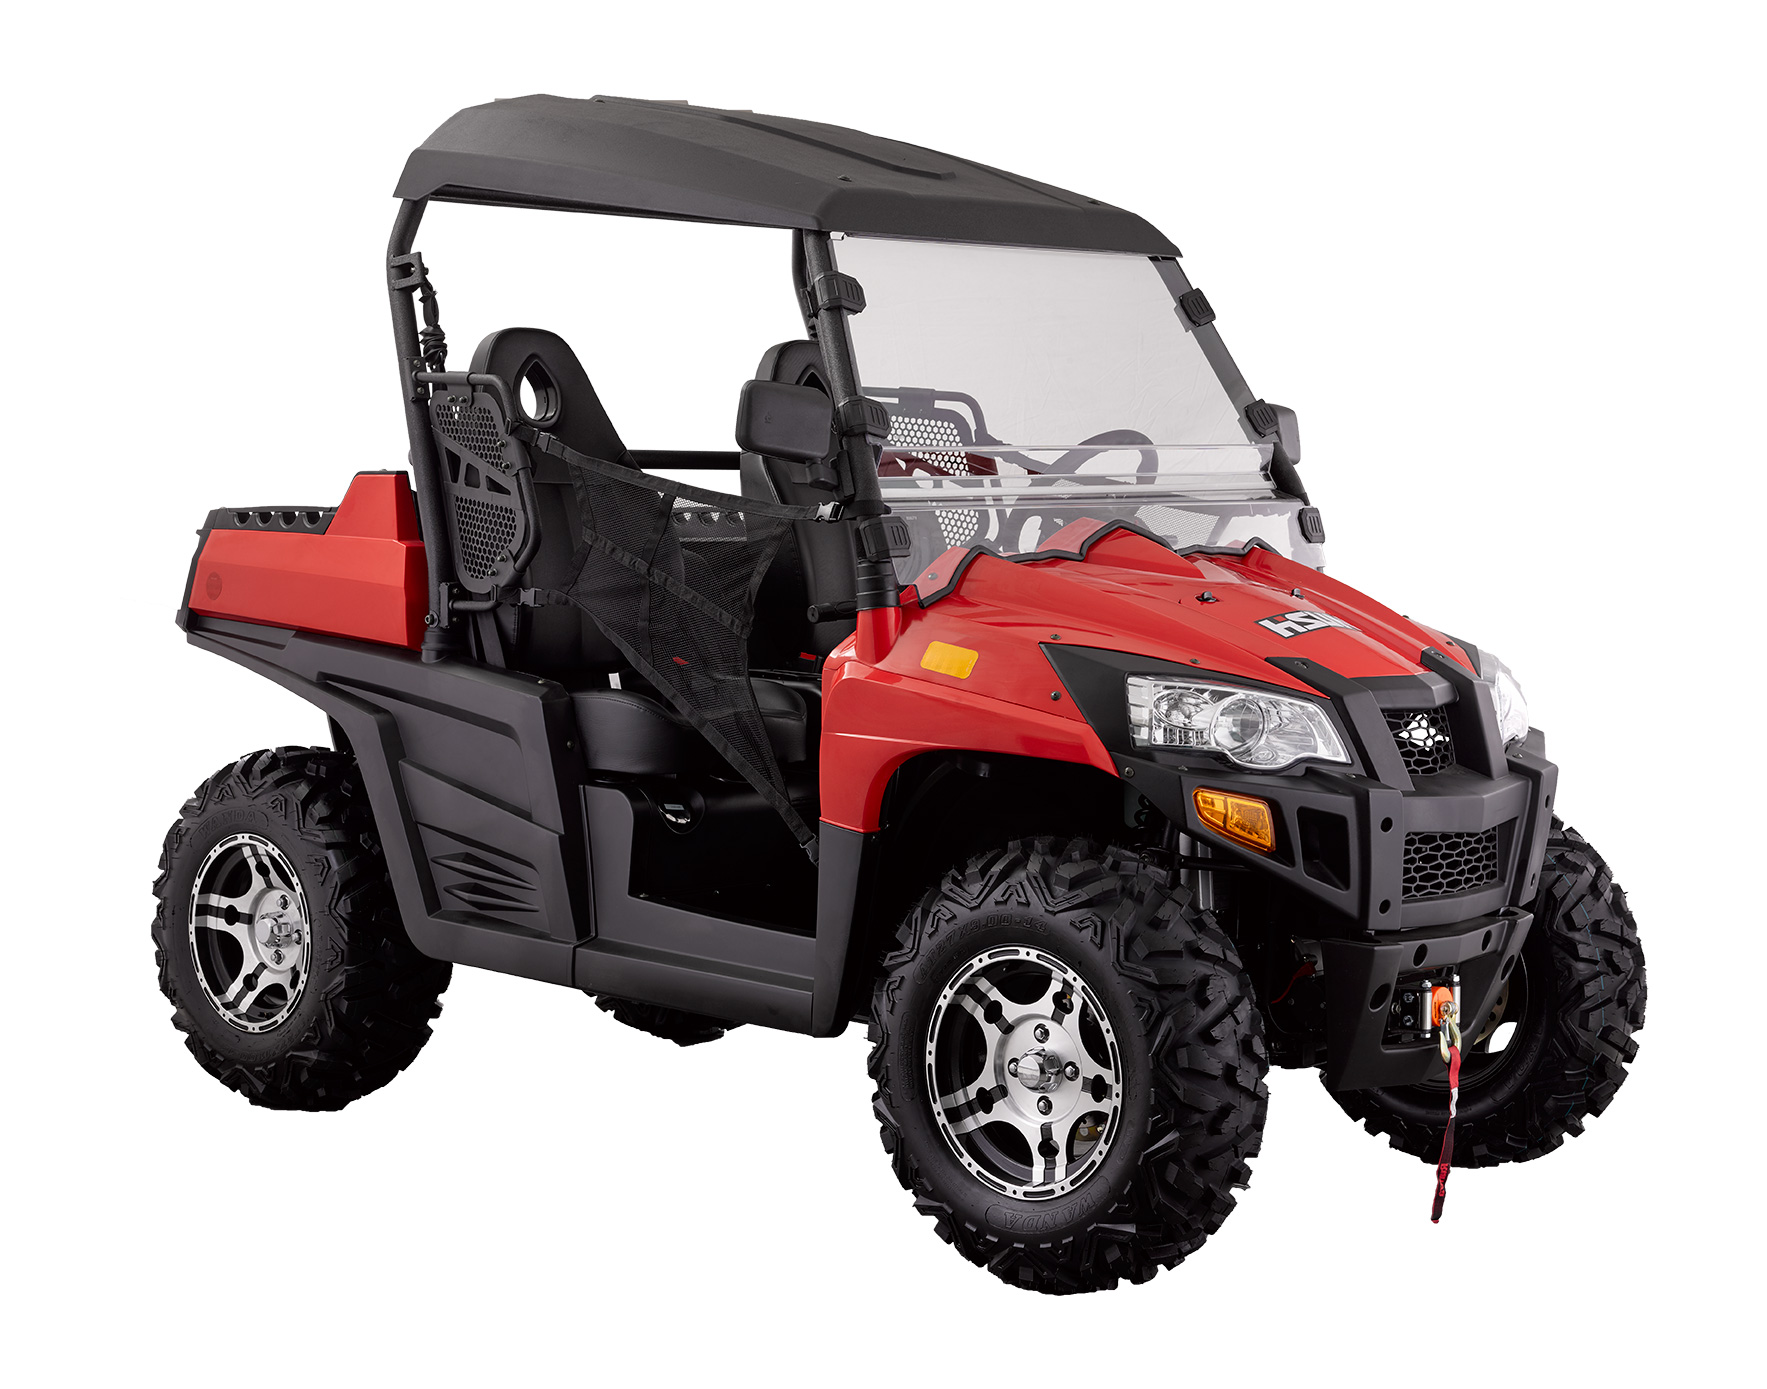 Buggy 570cc